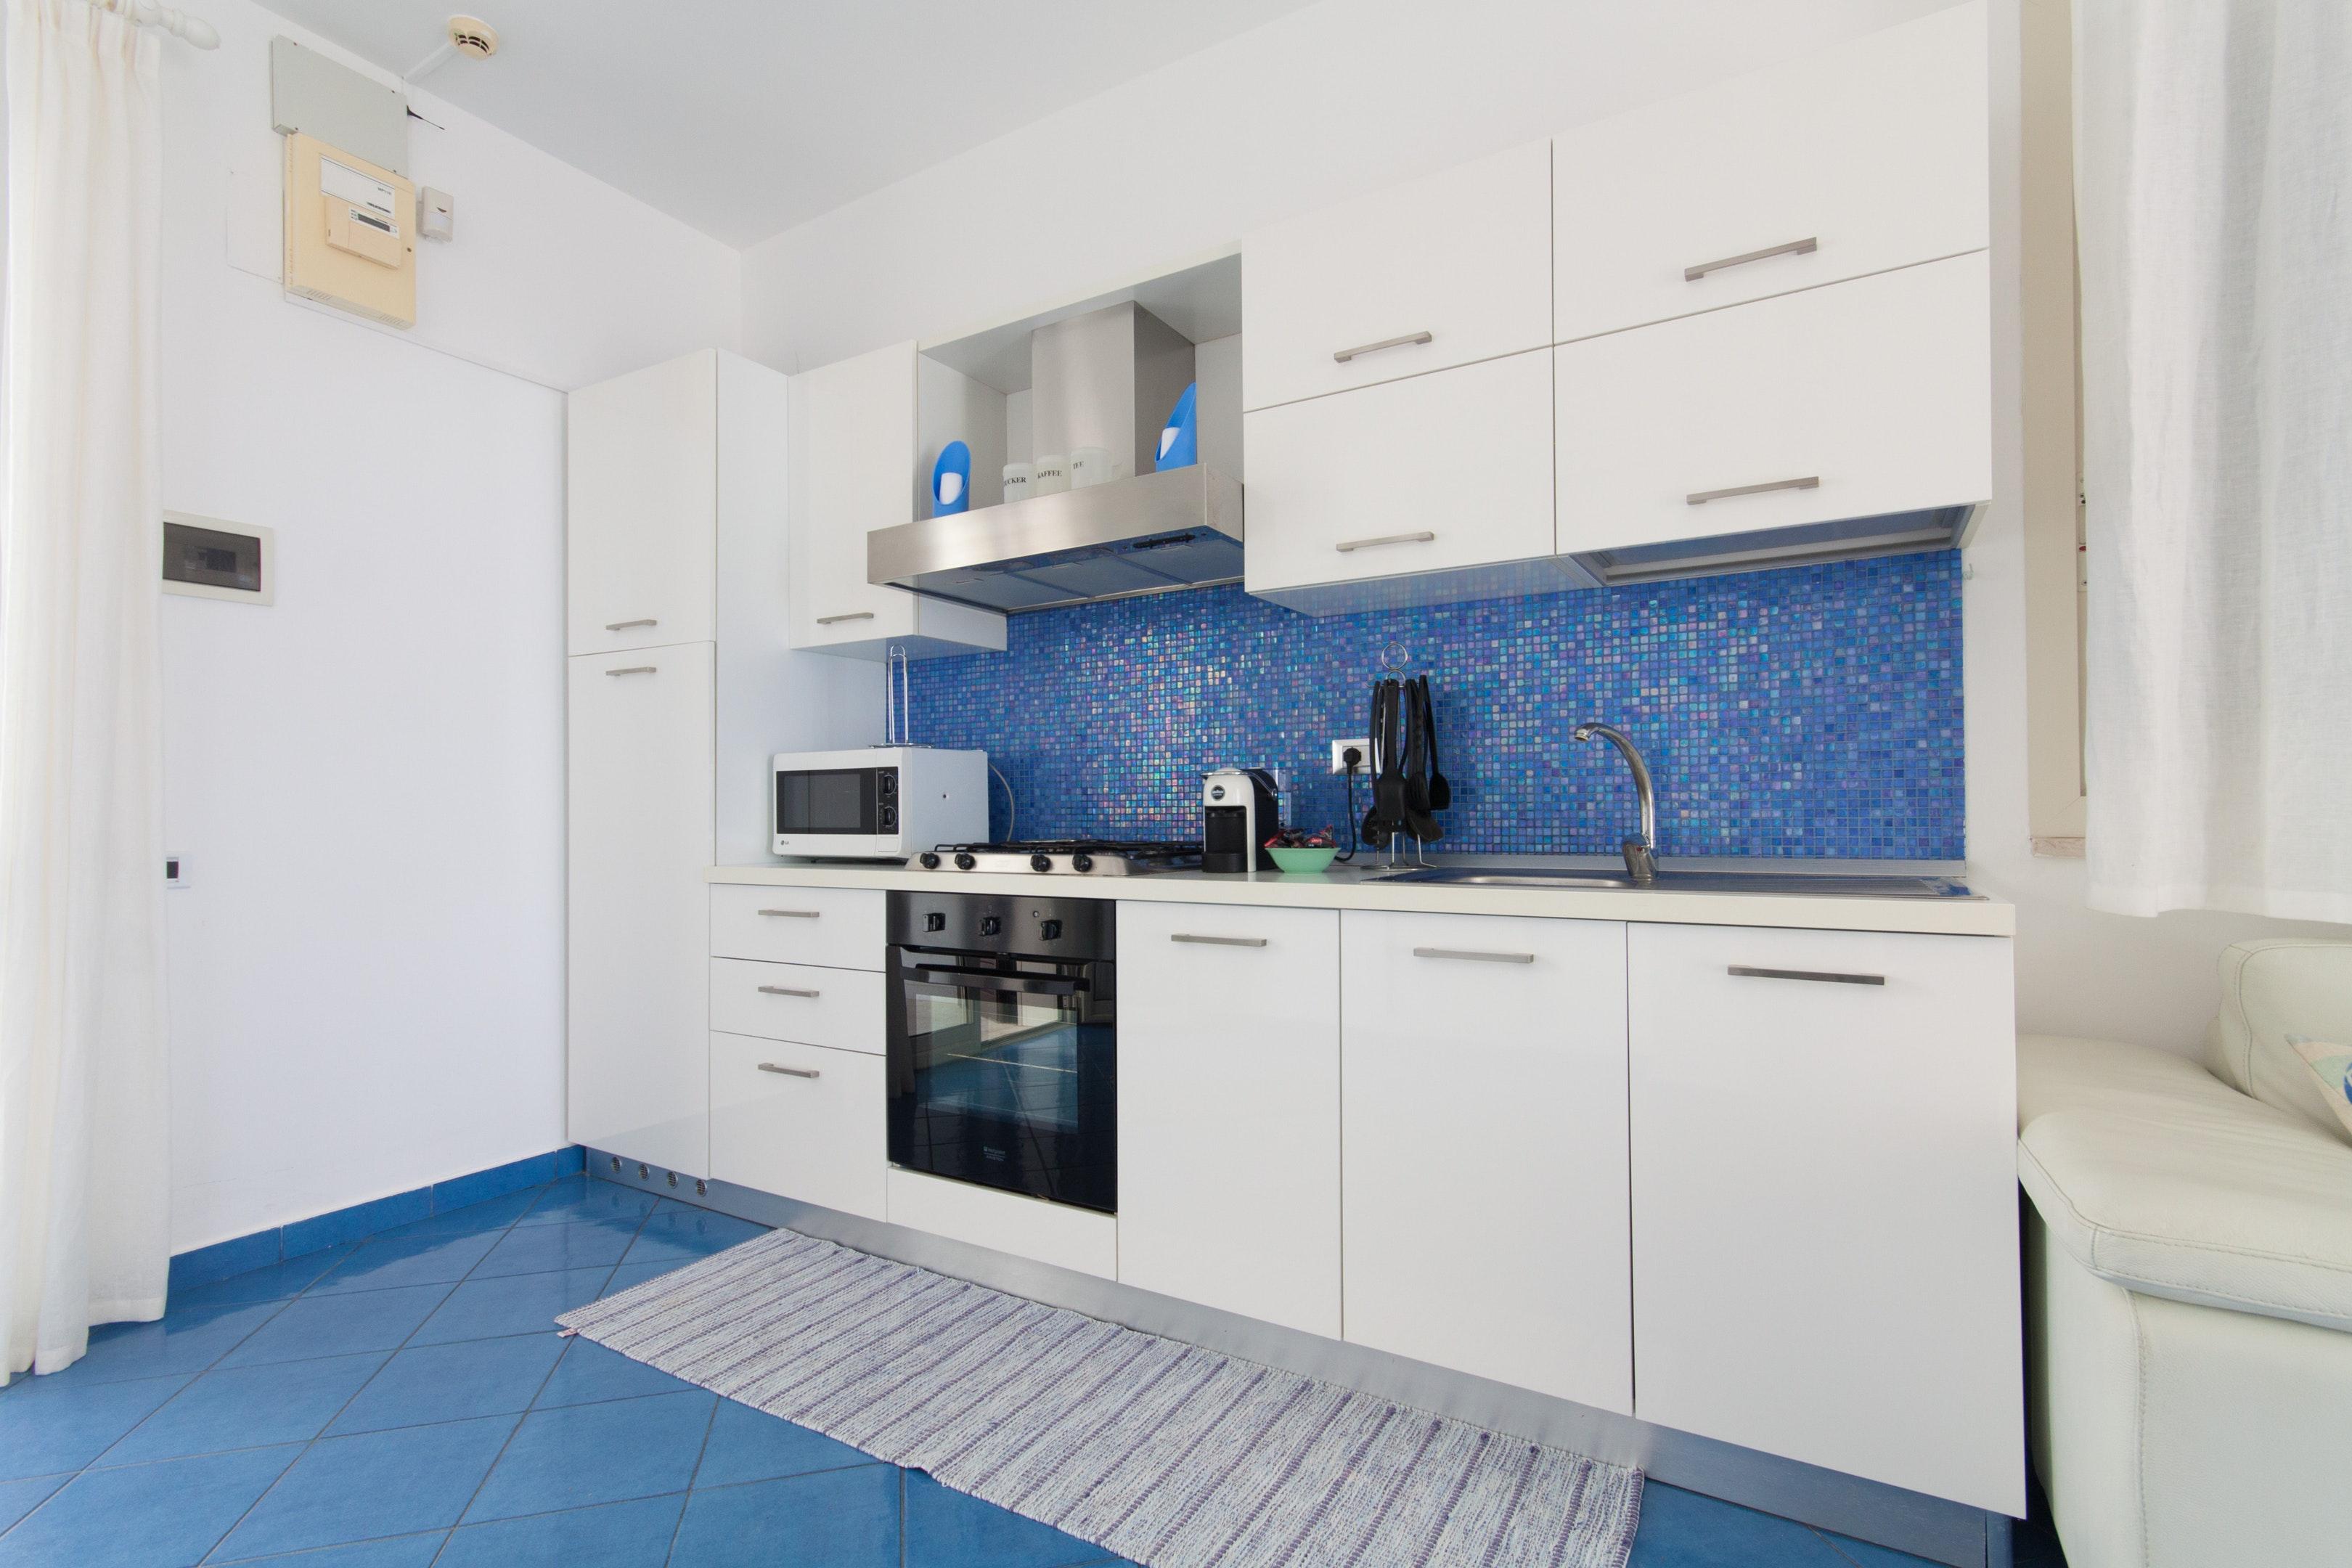 Holiday apartment Wohnung mit 3 Schlafzimmern in Piano di Trappeto mit herrlichem Meerblick, möblierter Terr (2271436), Balestrate, Palermo, Sicily, Italy, picture 10